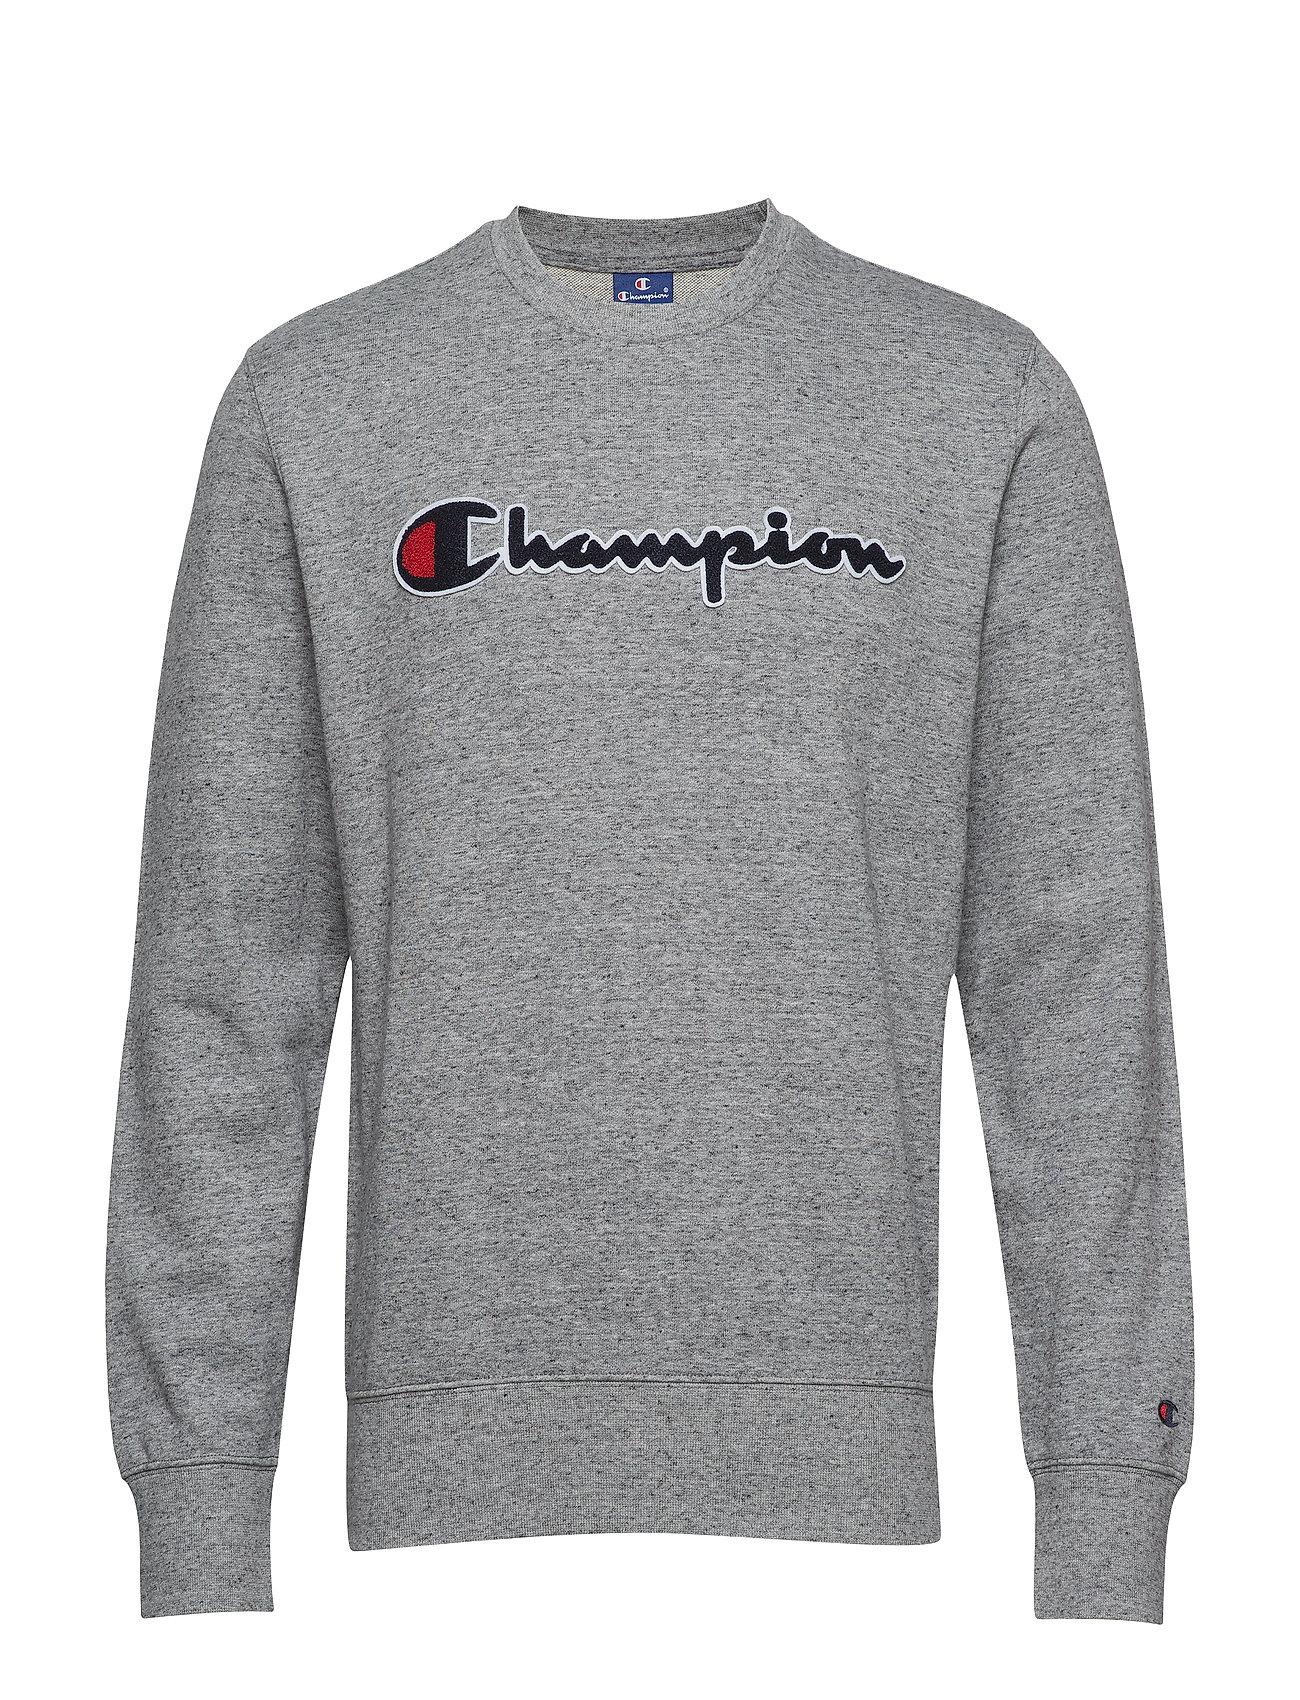 Champion Rochester Crewneck Sweatshirt - GREY MARL